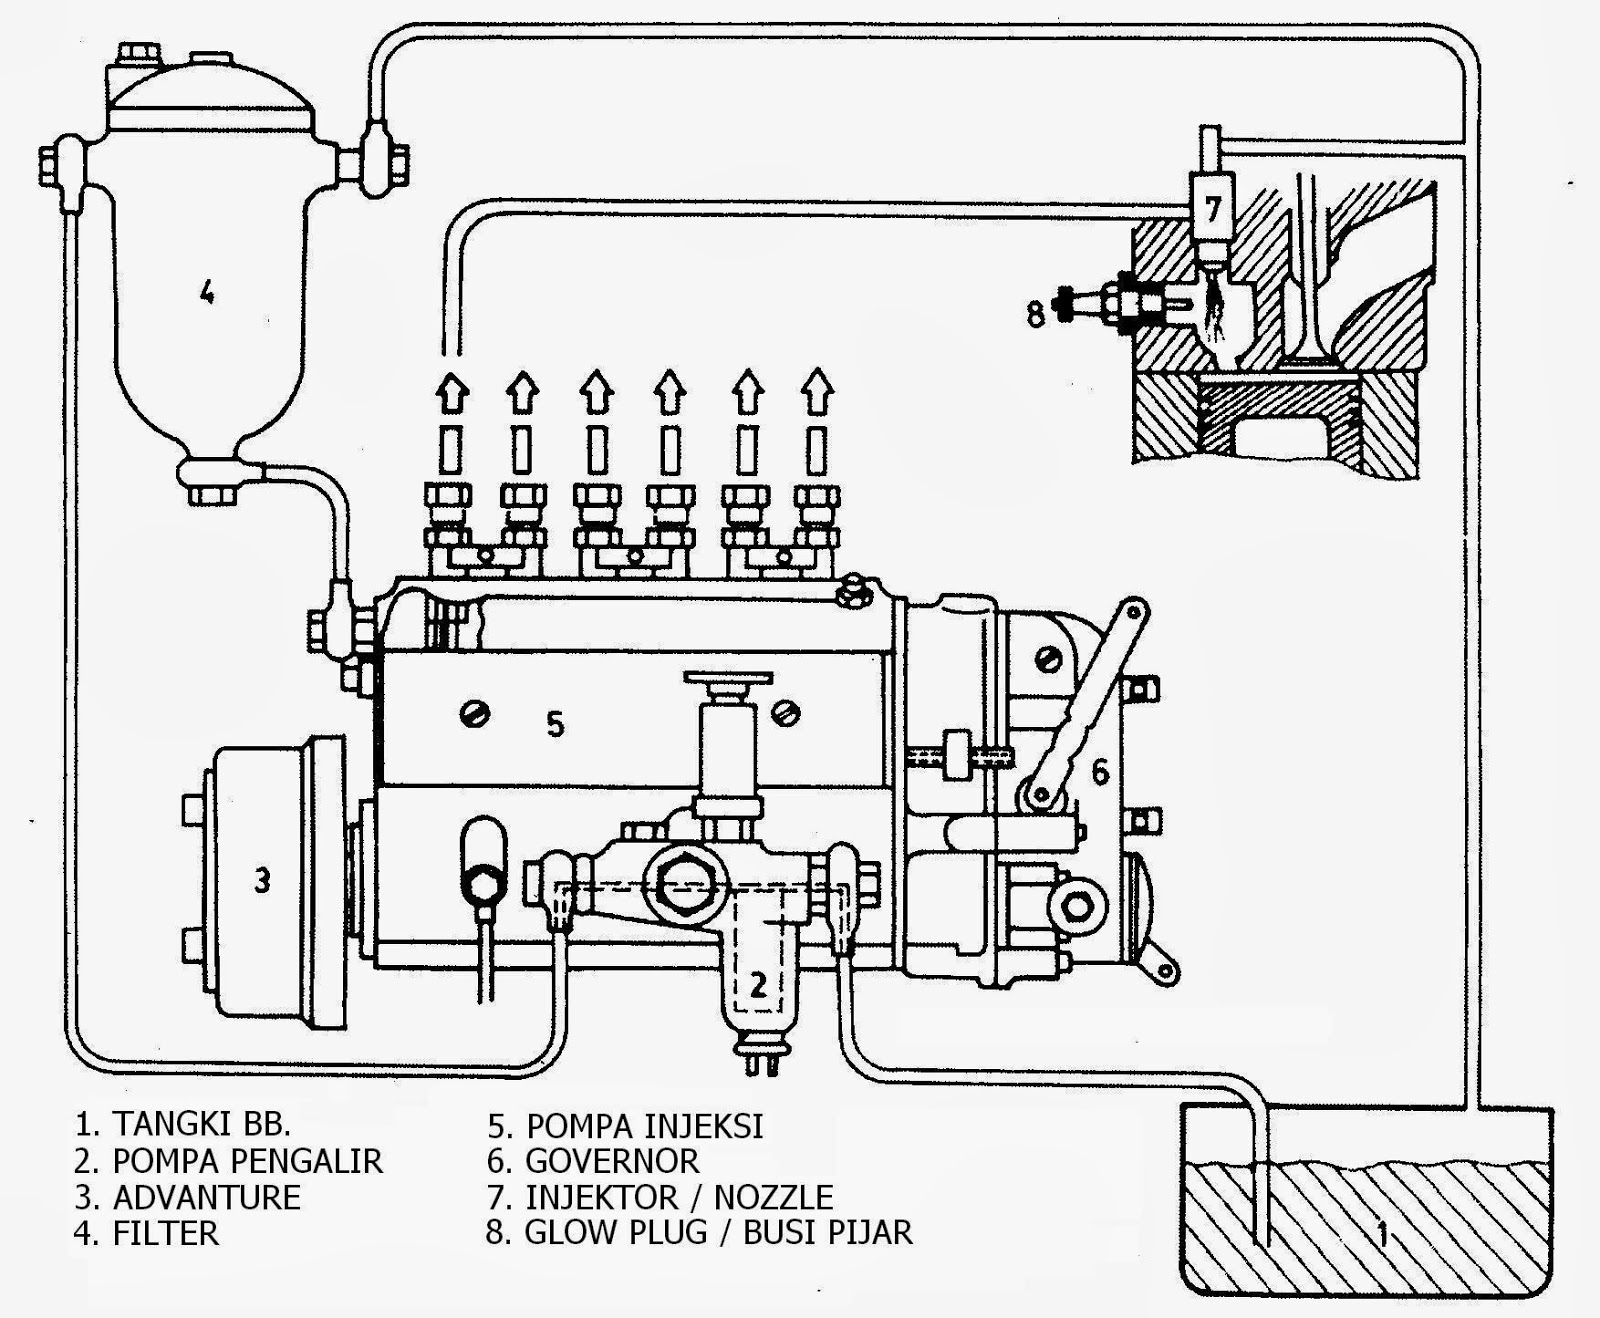 small resolution of 04 hyundai elantra fuse box diagram hyundai auto wiring 2003 hyundai santa fe audio wiring diagram 2000 hyundai tiburon wiring schematic